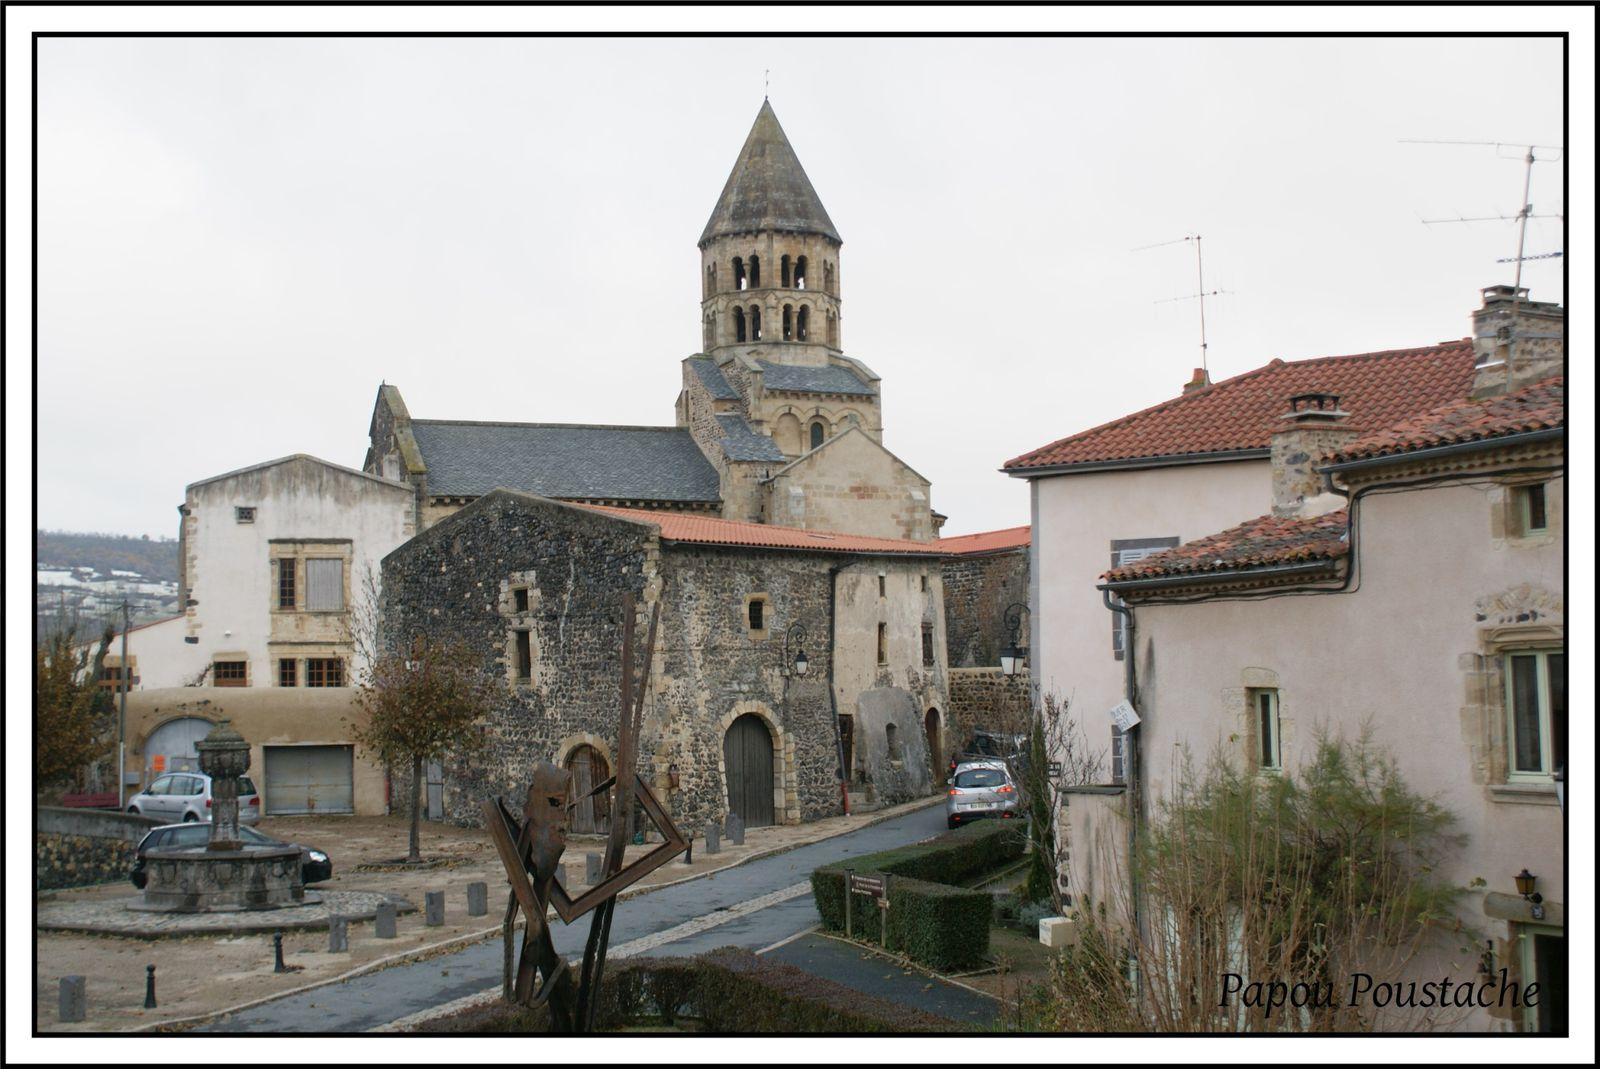 Les rues de Saint Saturnin